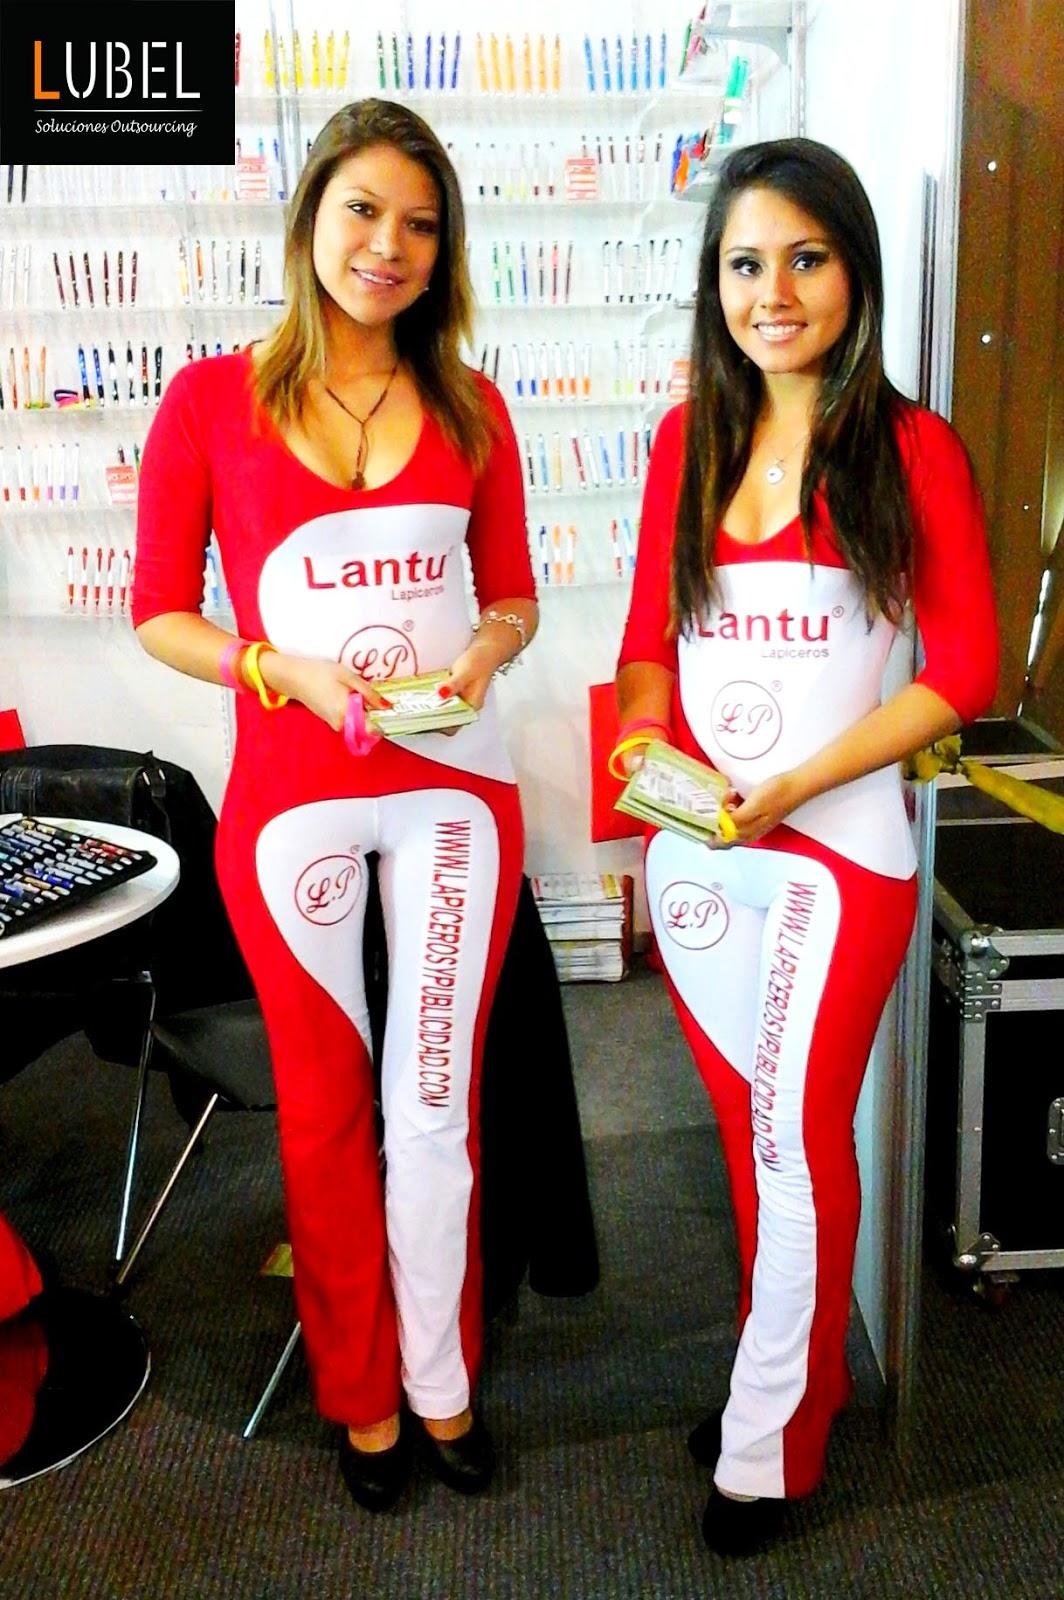 Anfitrionas de Lubel Arequipa en feria Grafinka para Lantu Lapiceros